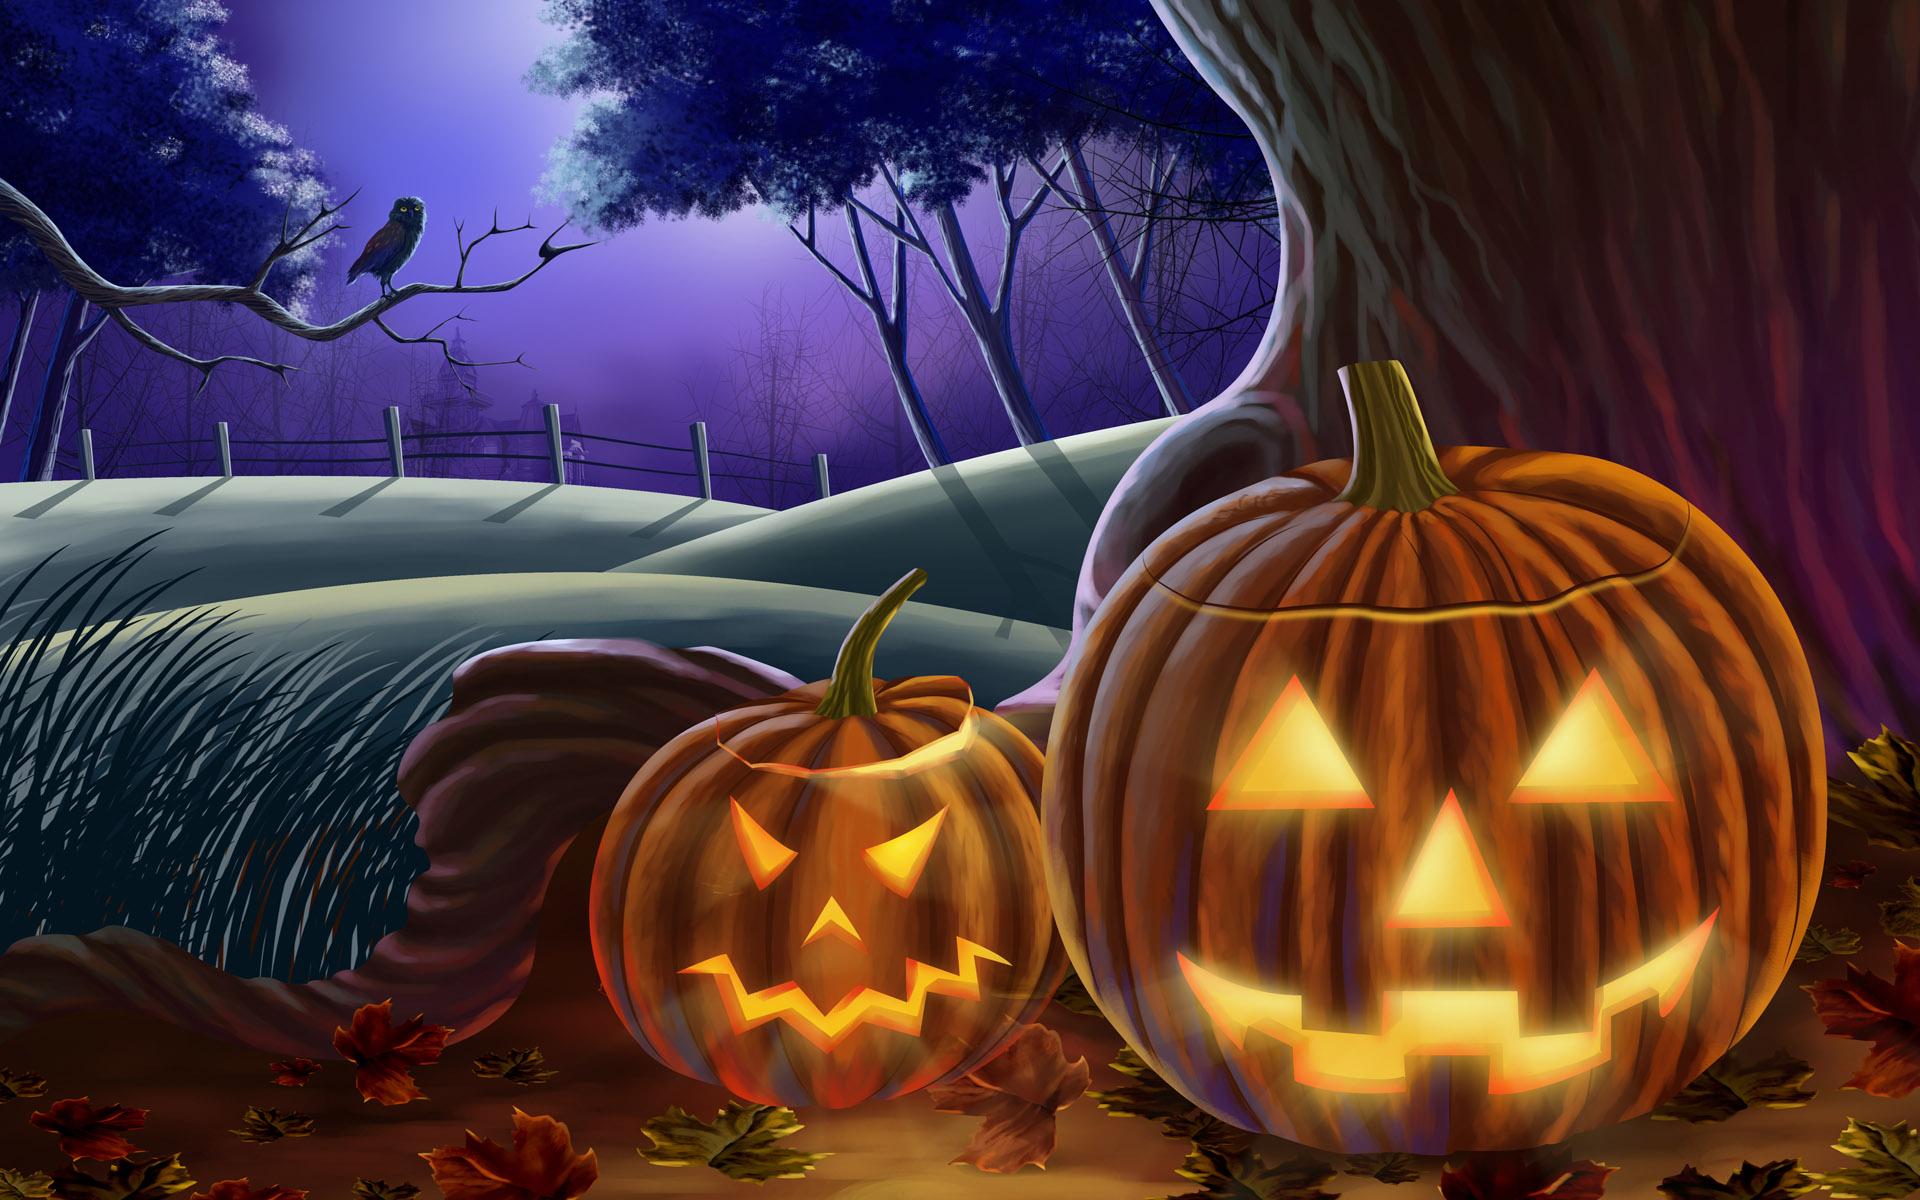 Тематические картинки хэллоуин